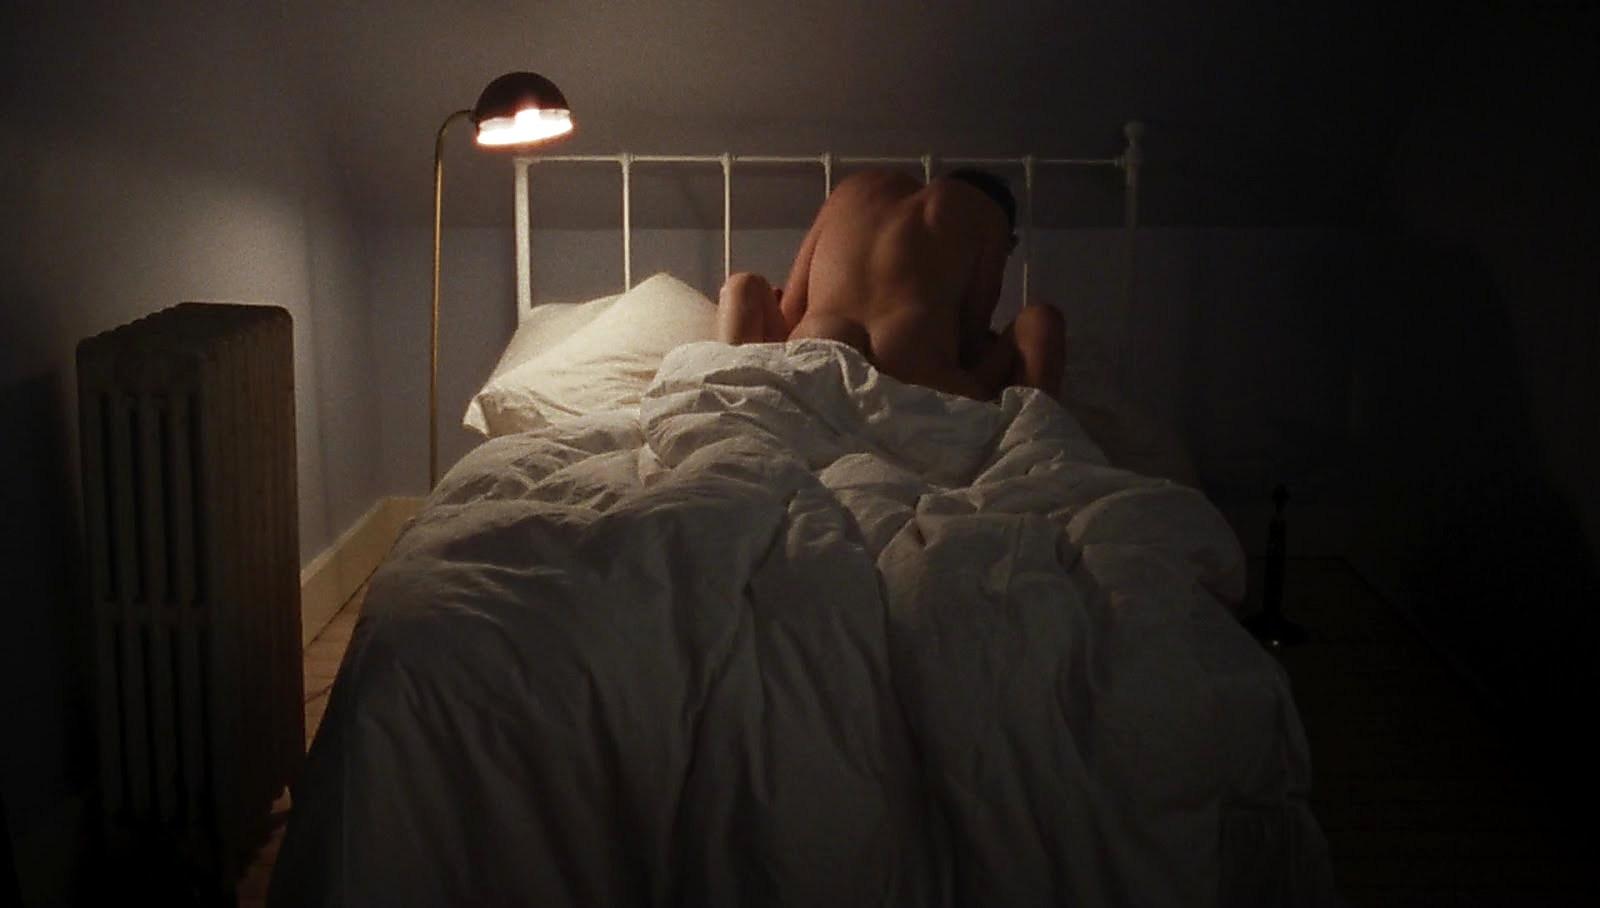 Chris O Dowd sexy shirtless scene July 28, 2018, 1pm